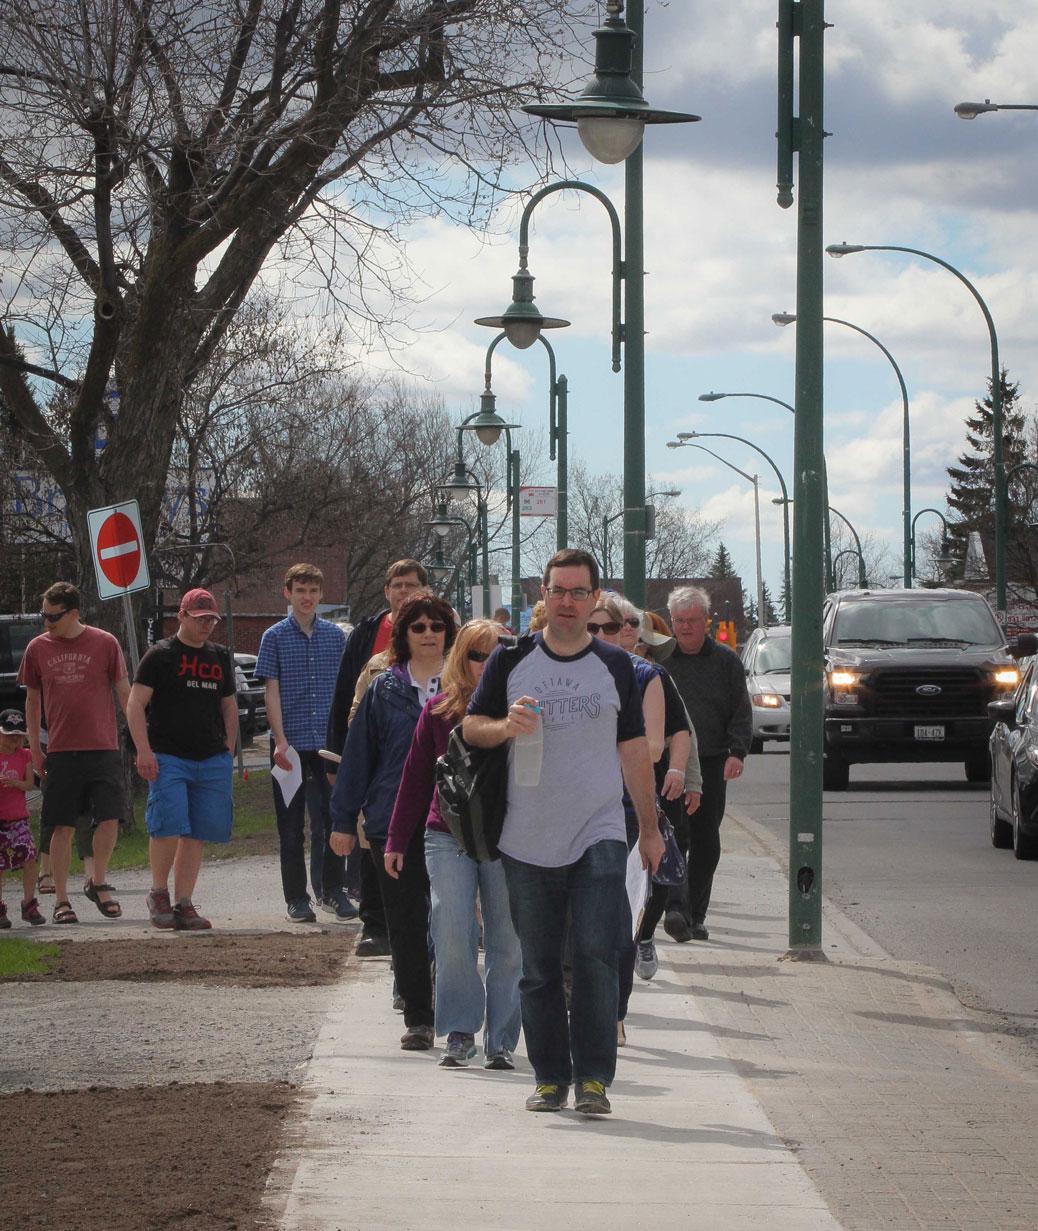 Jane's Walk 2016 on Stittsville Main Street. Photo by Barry Gray.